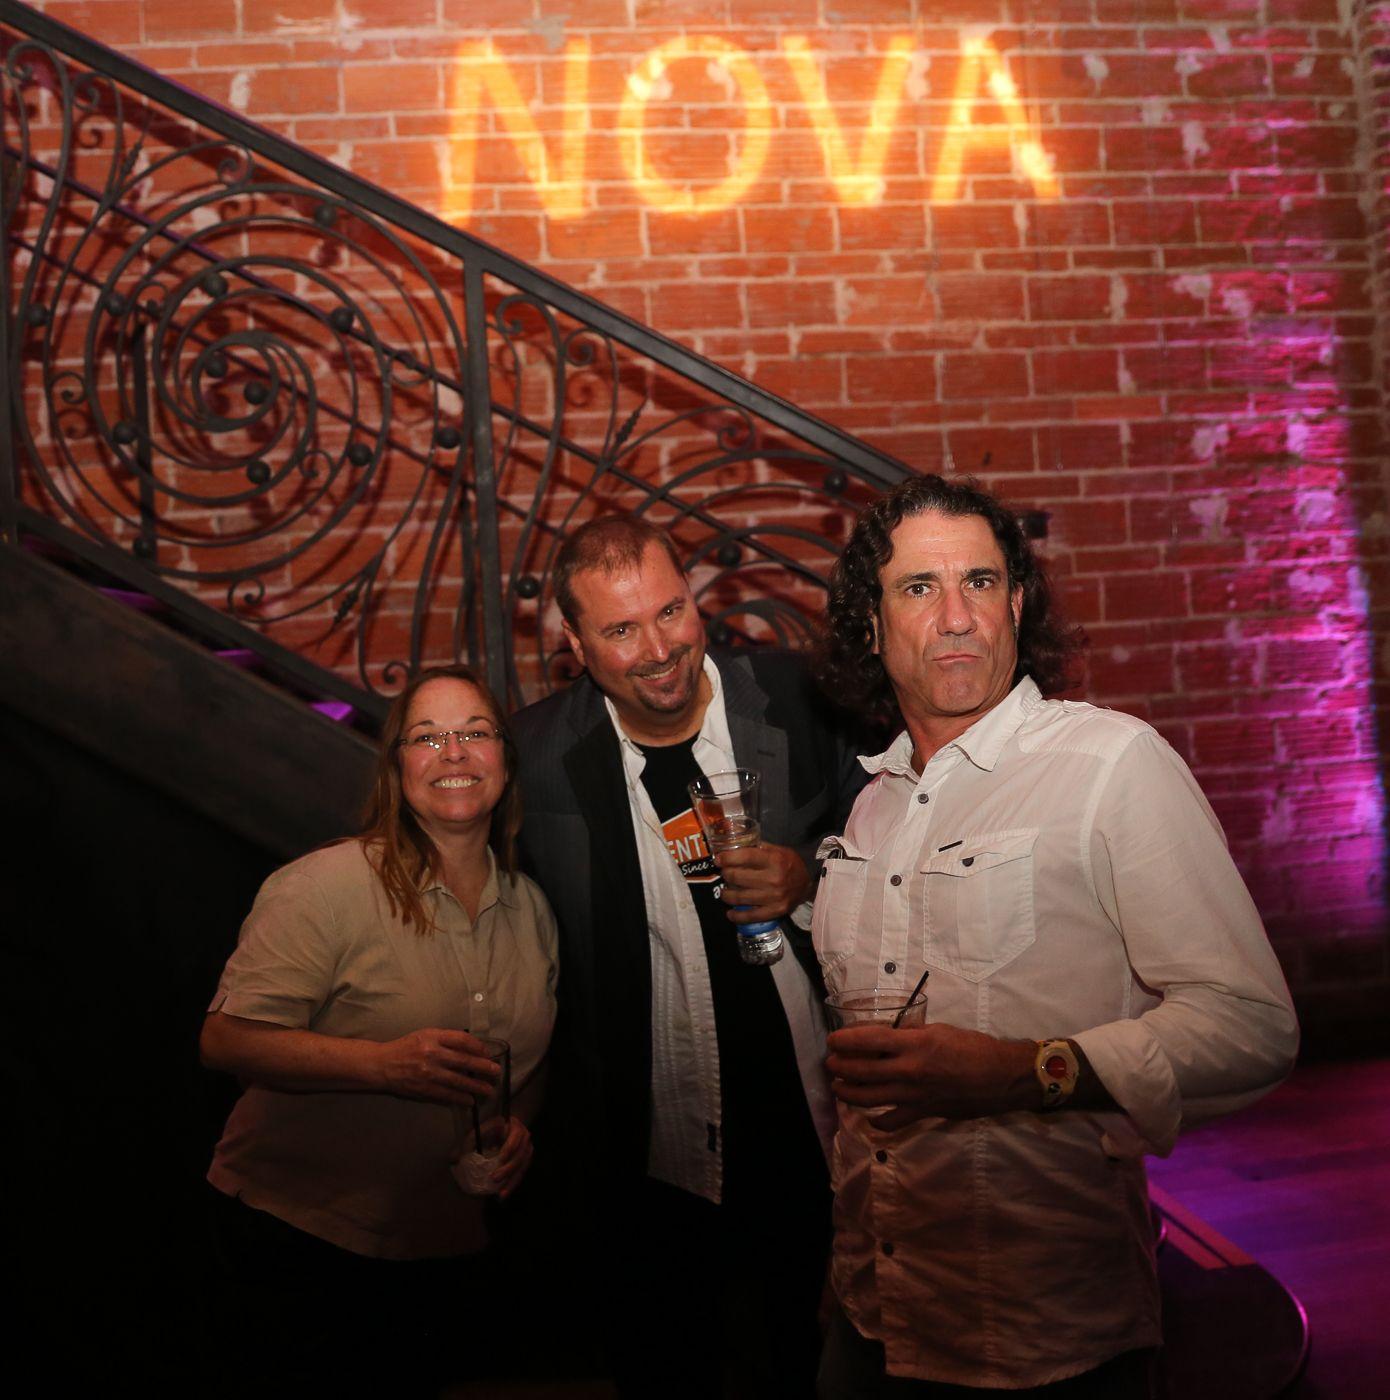 2015 07-24 Boca-Ciega-High-School-30th-Reunion-at-venue-NOVA-535-downtown-StPete-117